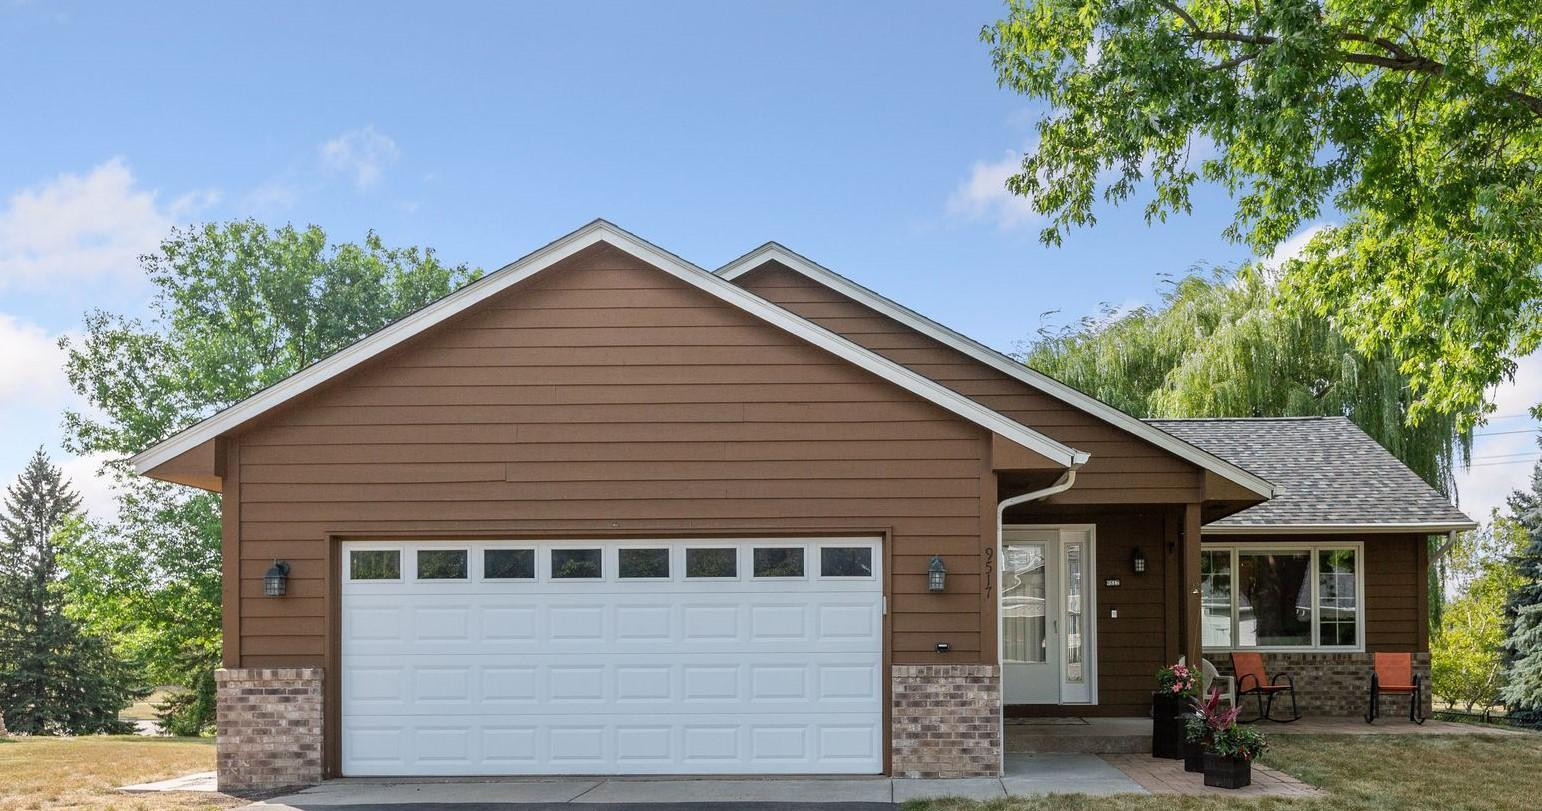 9517 Rosewood Lane N, Maple Grove, MN 55369